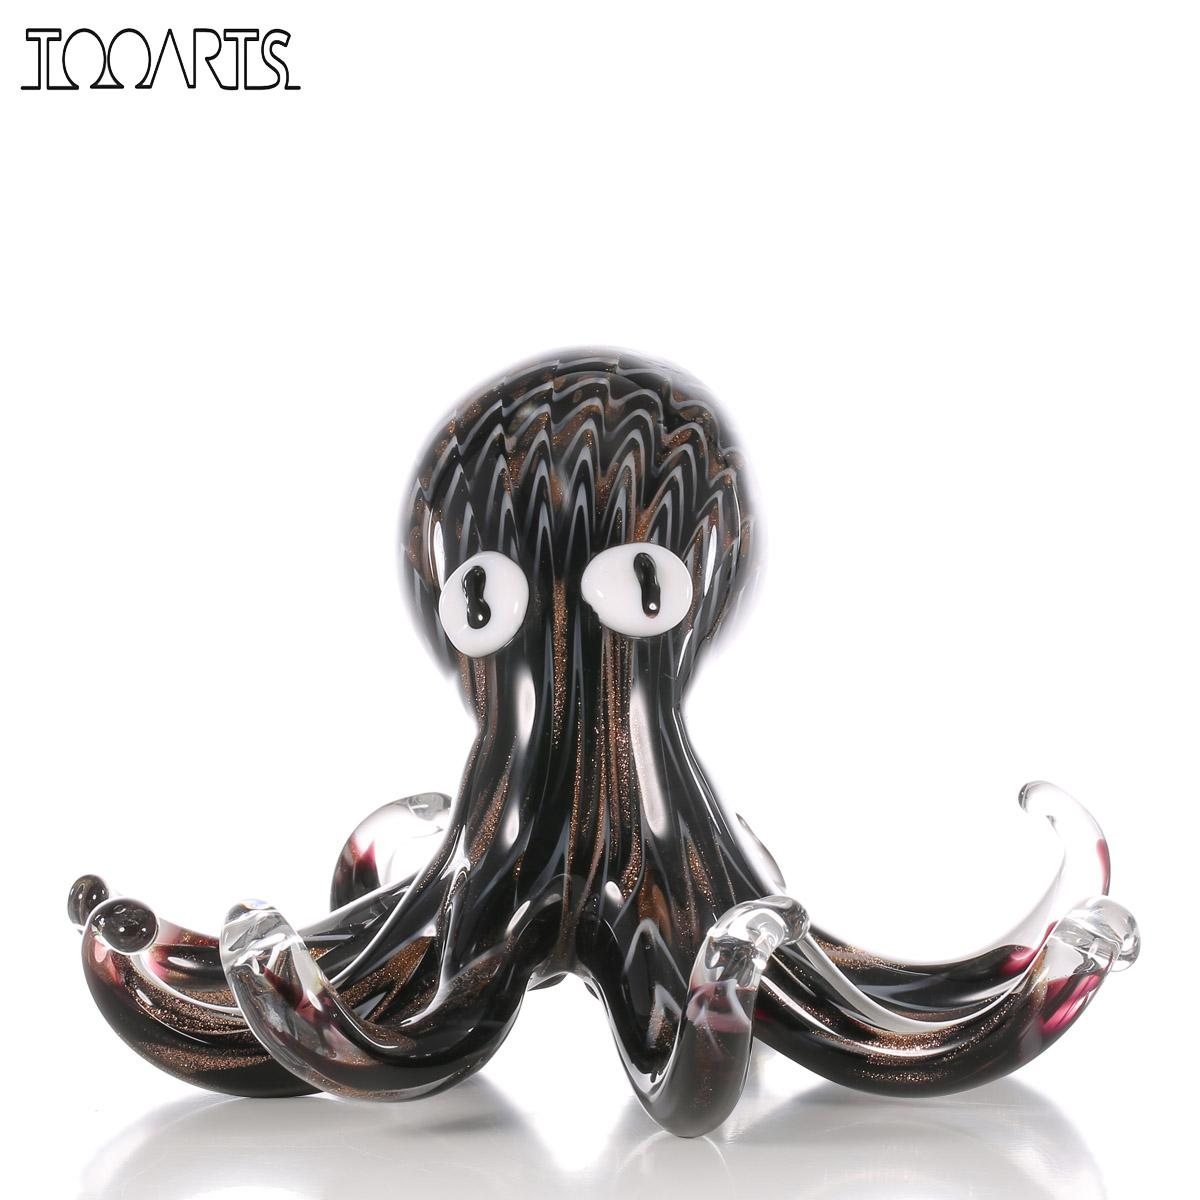 Tooarts Black Gold Art Octopus Gift Glass Ornament Animal Figurine Modern Home Decoration Accessory Handblown Home